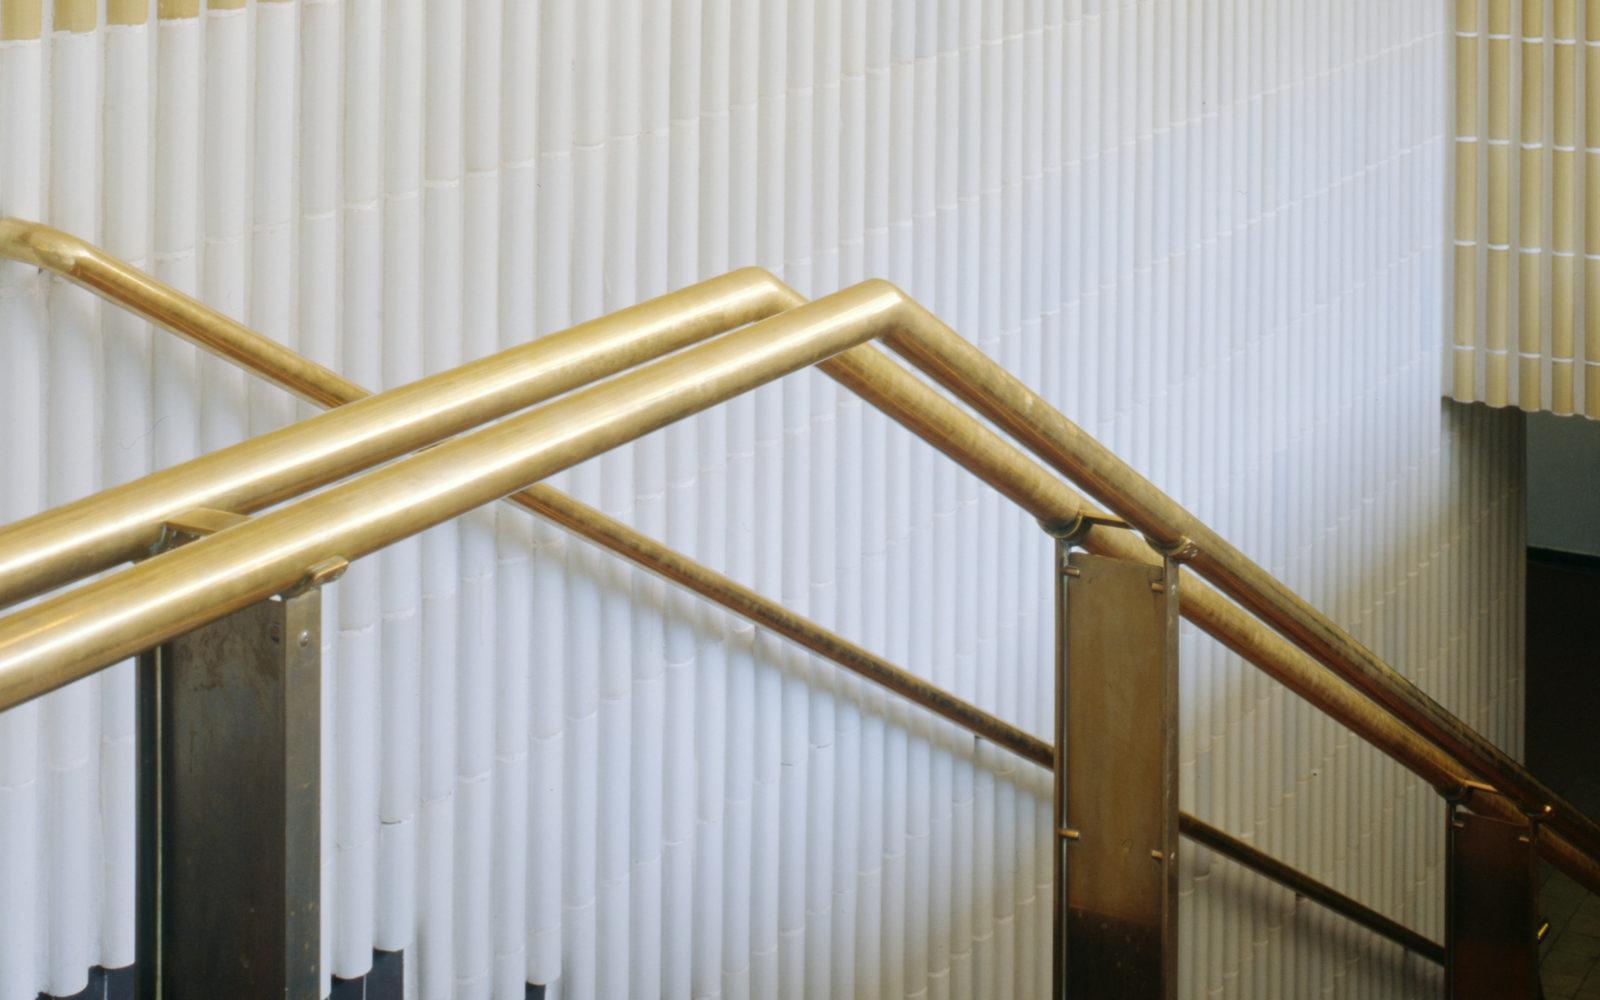 kansanelakelaitos-helsinki-portaat-sauvatiilet-kuva-maija-holma-alvar-aalto-museo